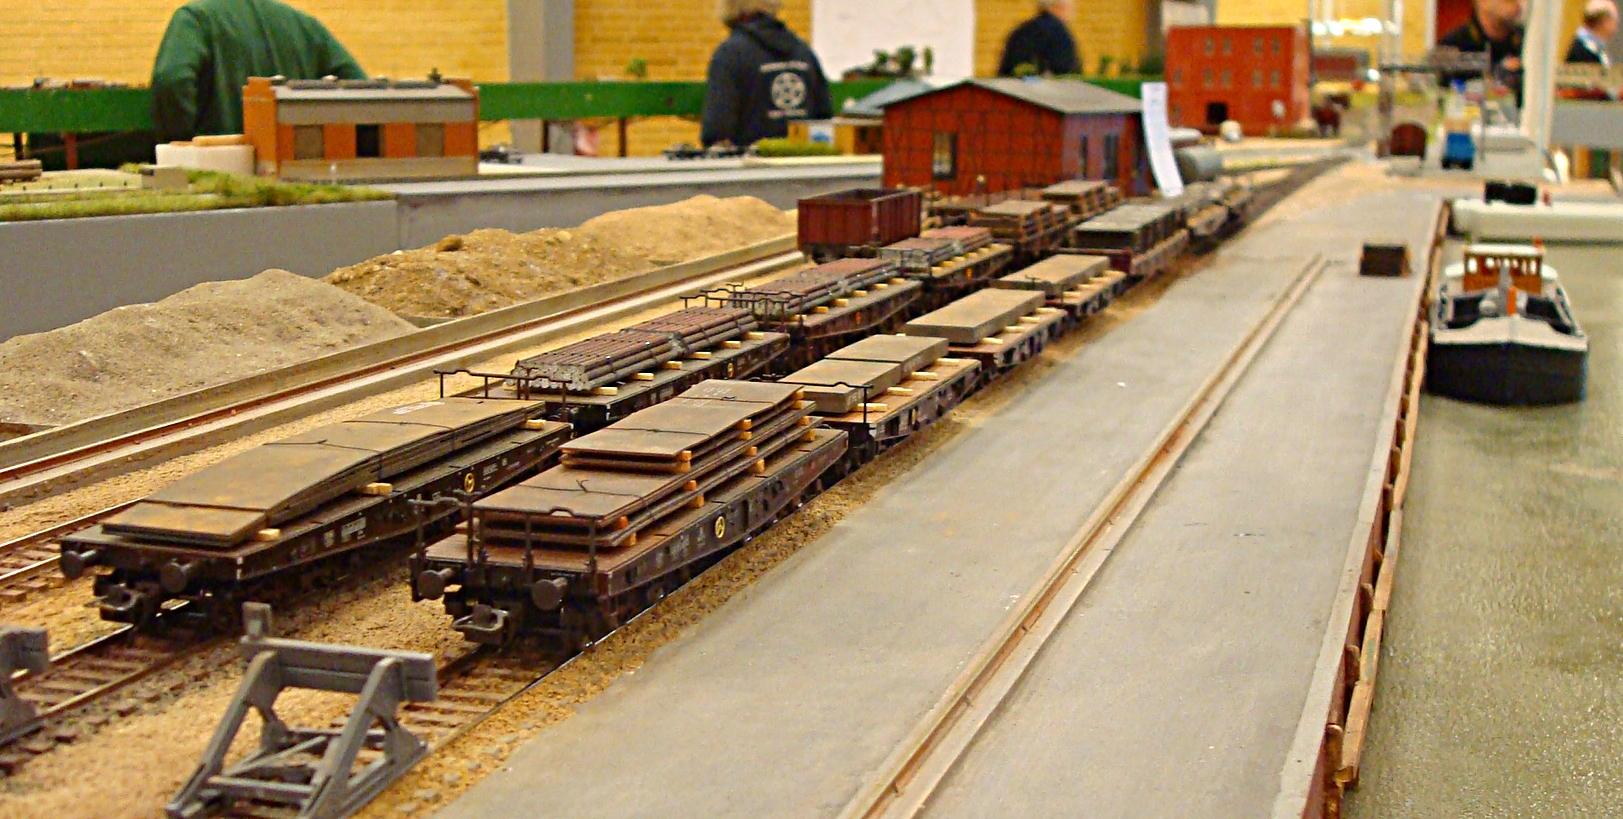 Sværgodsvogne med stål